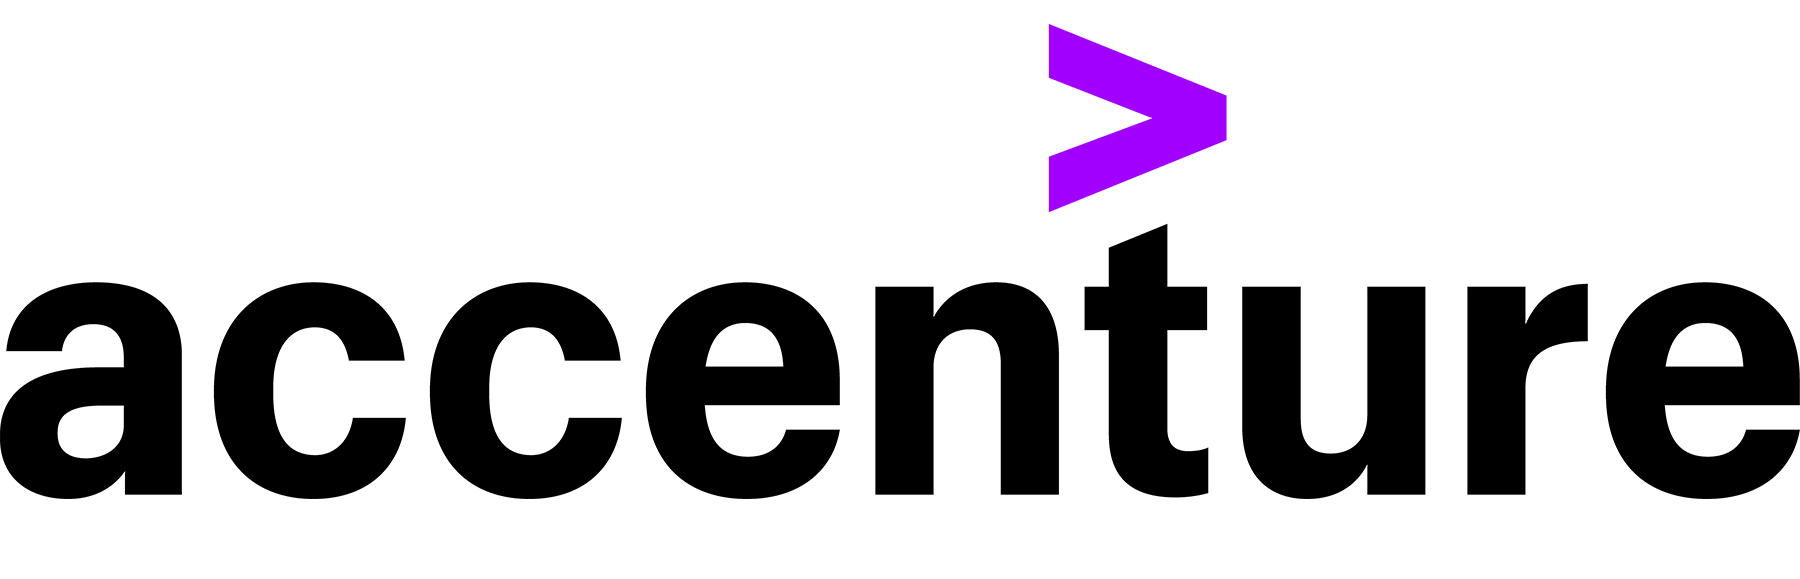 i.s.s of accenture logo